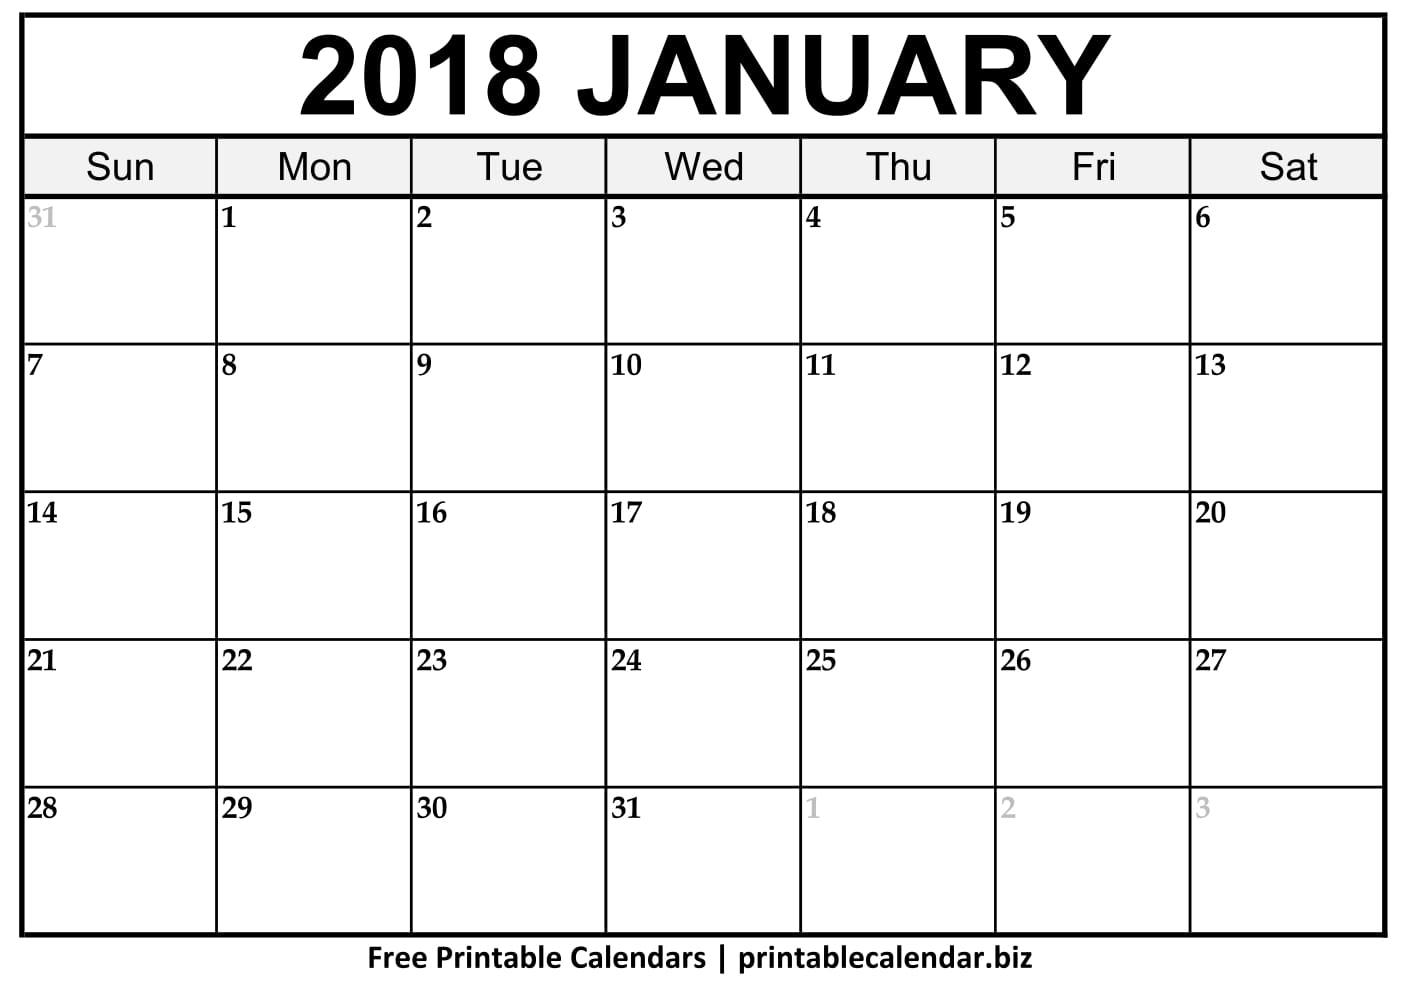 2019 Printable Calendar Templates - Printablecalendar.biz for Picture Of A January Calender